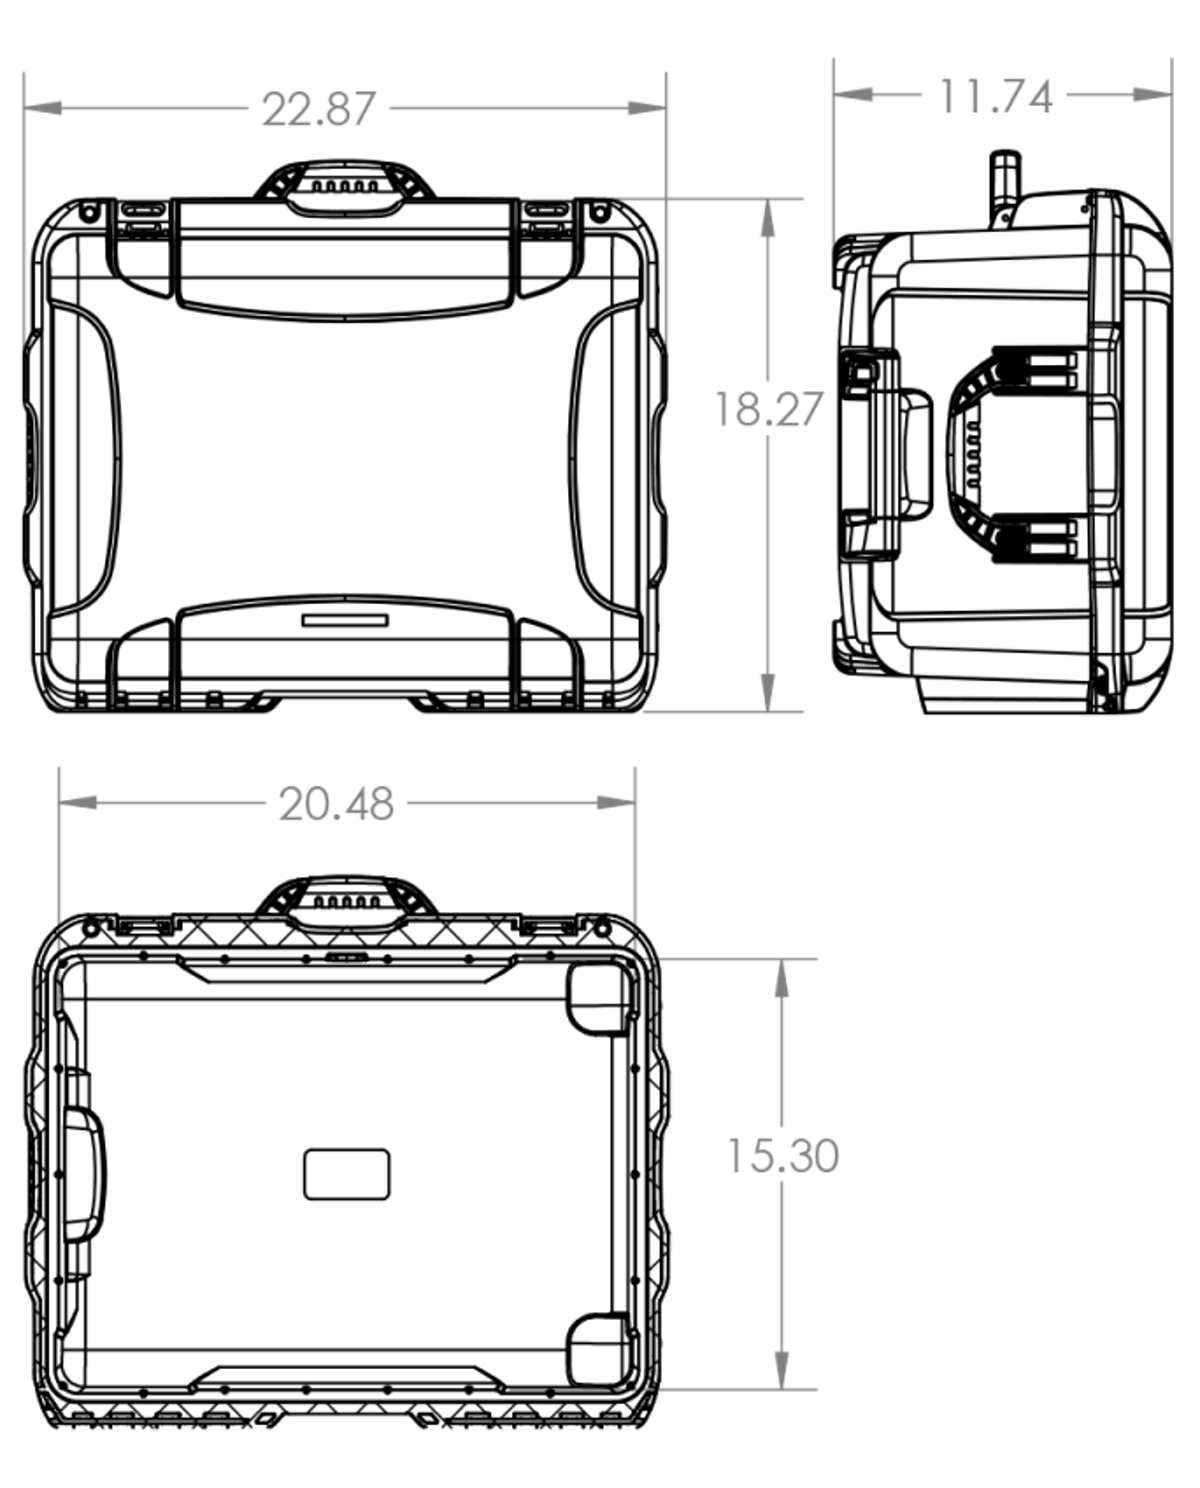 Dimensions of the Nanuk 950 DJI Phantom Hard Case